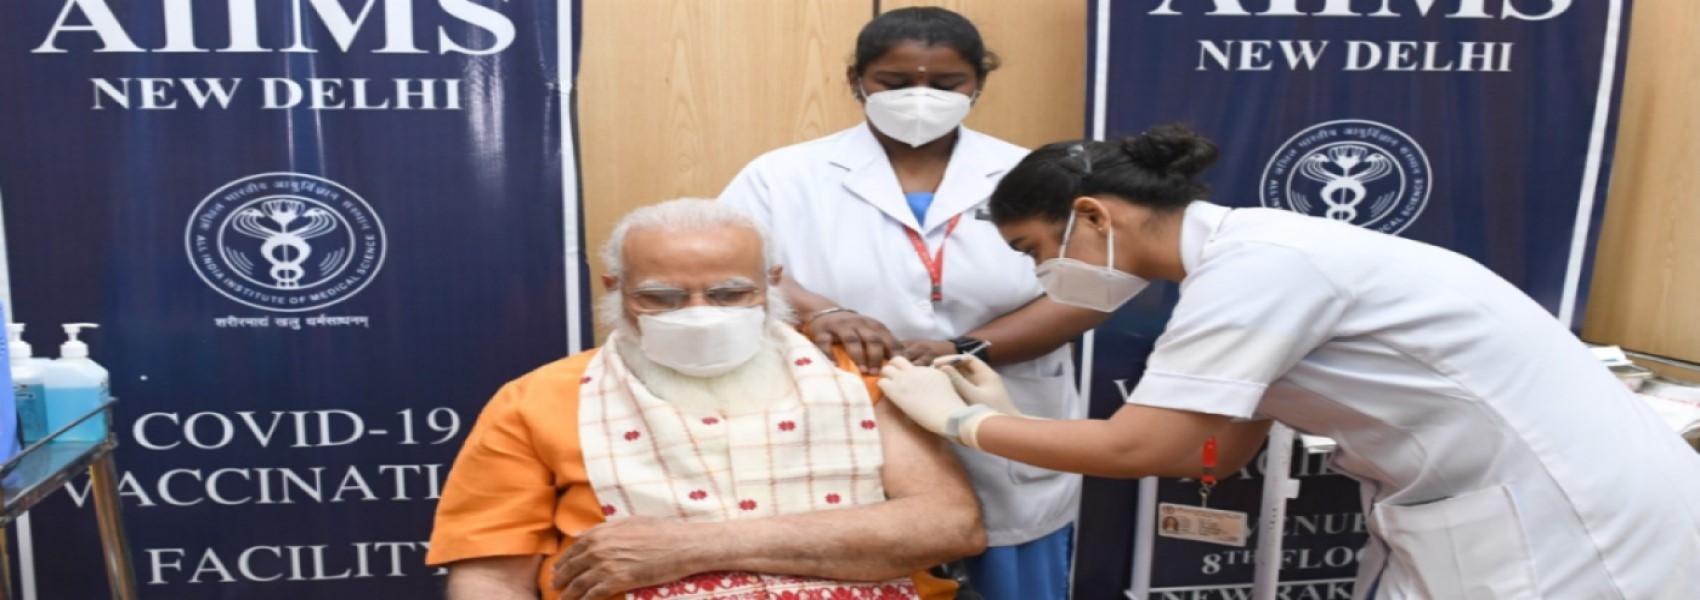 Honorable Prime Minister, Shri Narendra Modi takes second dose of the COVID-19 vaccine, at AIIMS, New Delhi on April 08, 2021